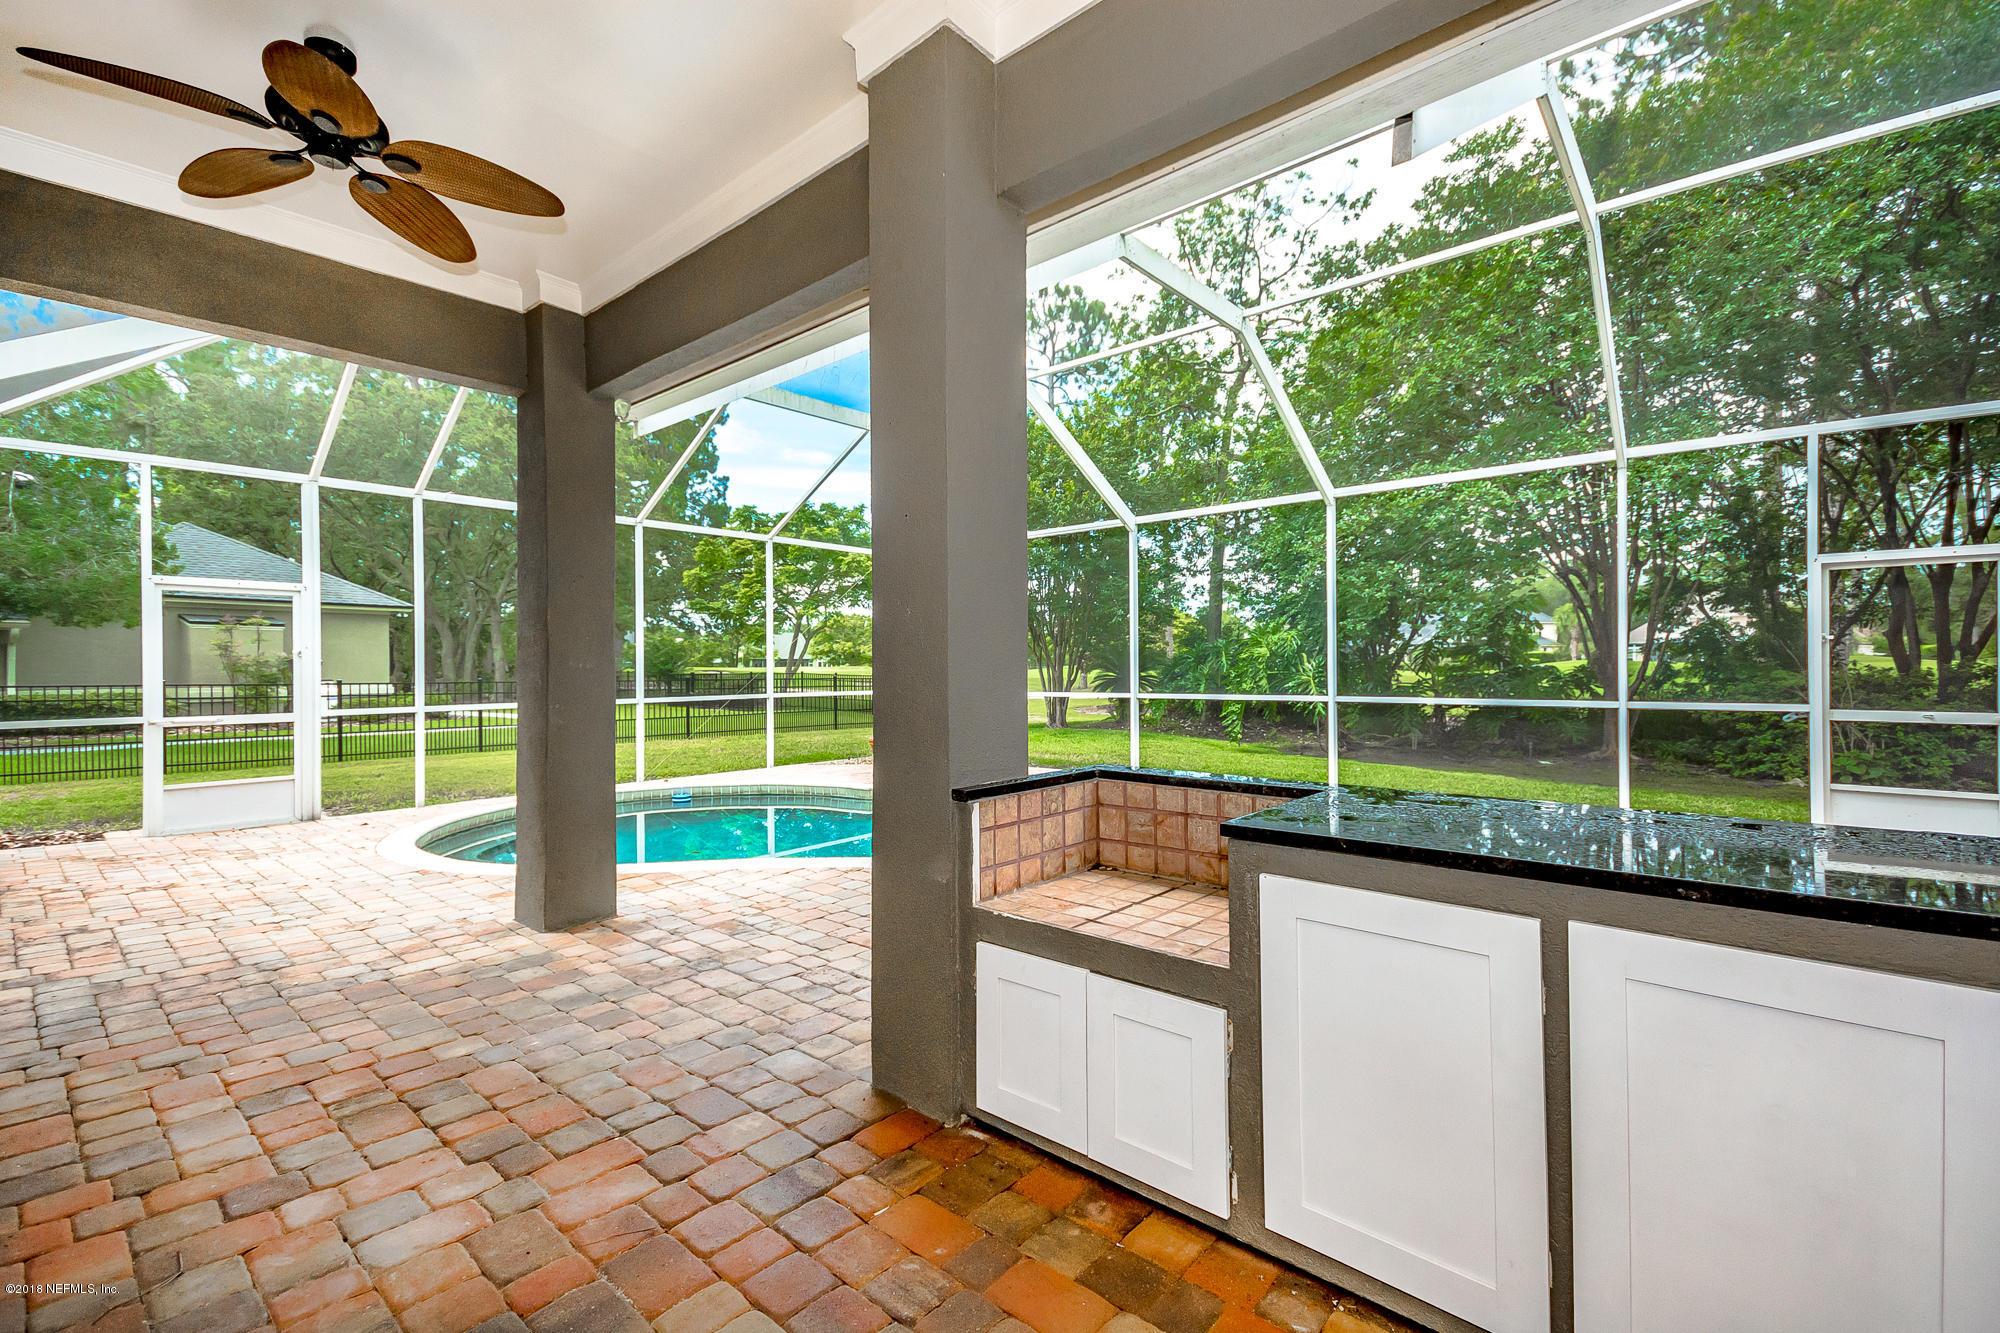 3758 PLANTERS CREEK, JACKSONVILLE, FLORIDA 32224, 5 Bedrooms Bedrooms, ,4 BathroomsBathrooms,Residential - single family,For sale,PLANTERS CREEK,942158